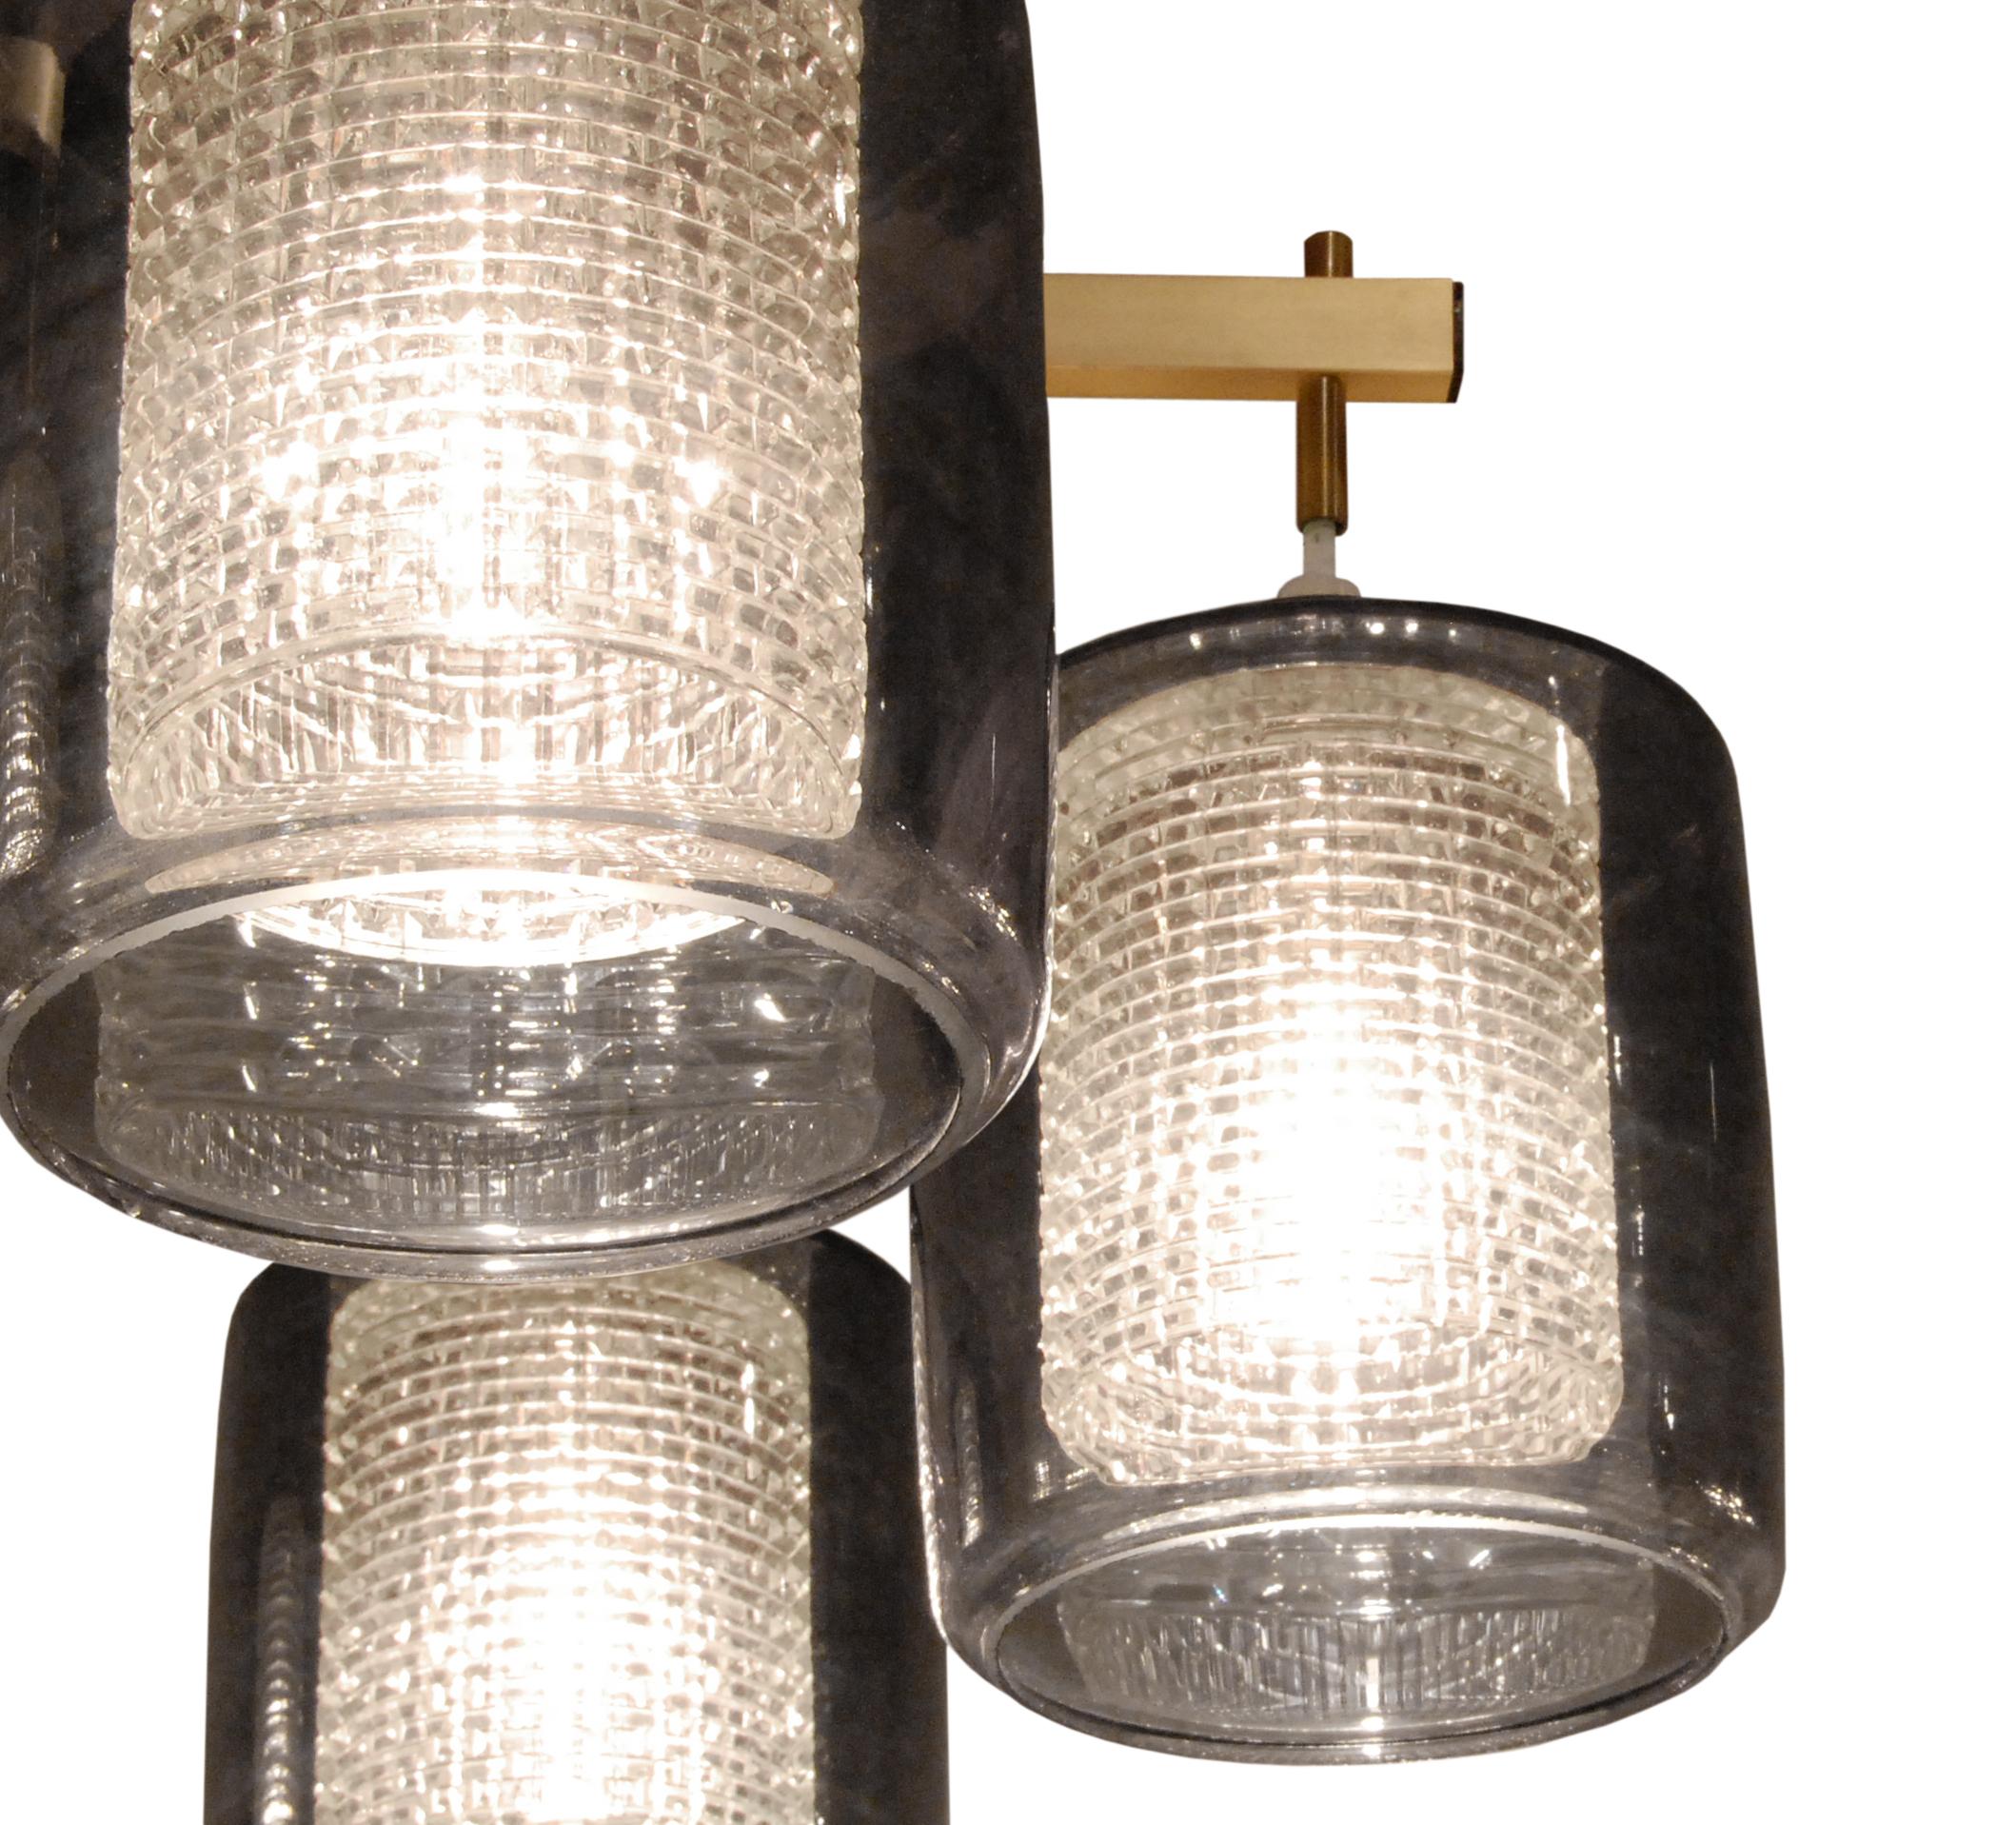 50's 45 Lrg rnd 6 glass shadesbrass chandelier157 shade detail hires.jpg